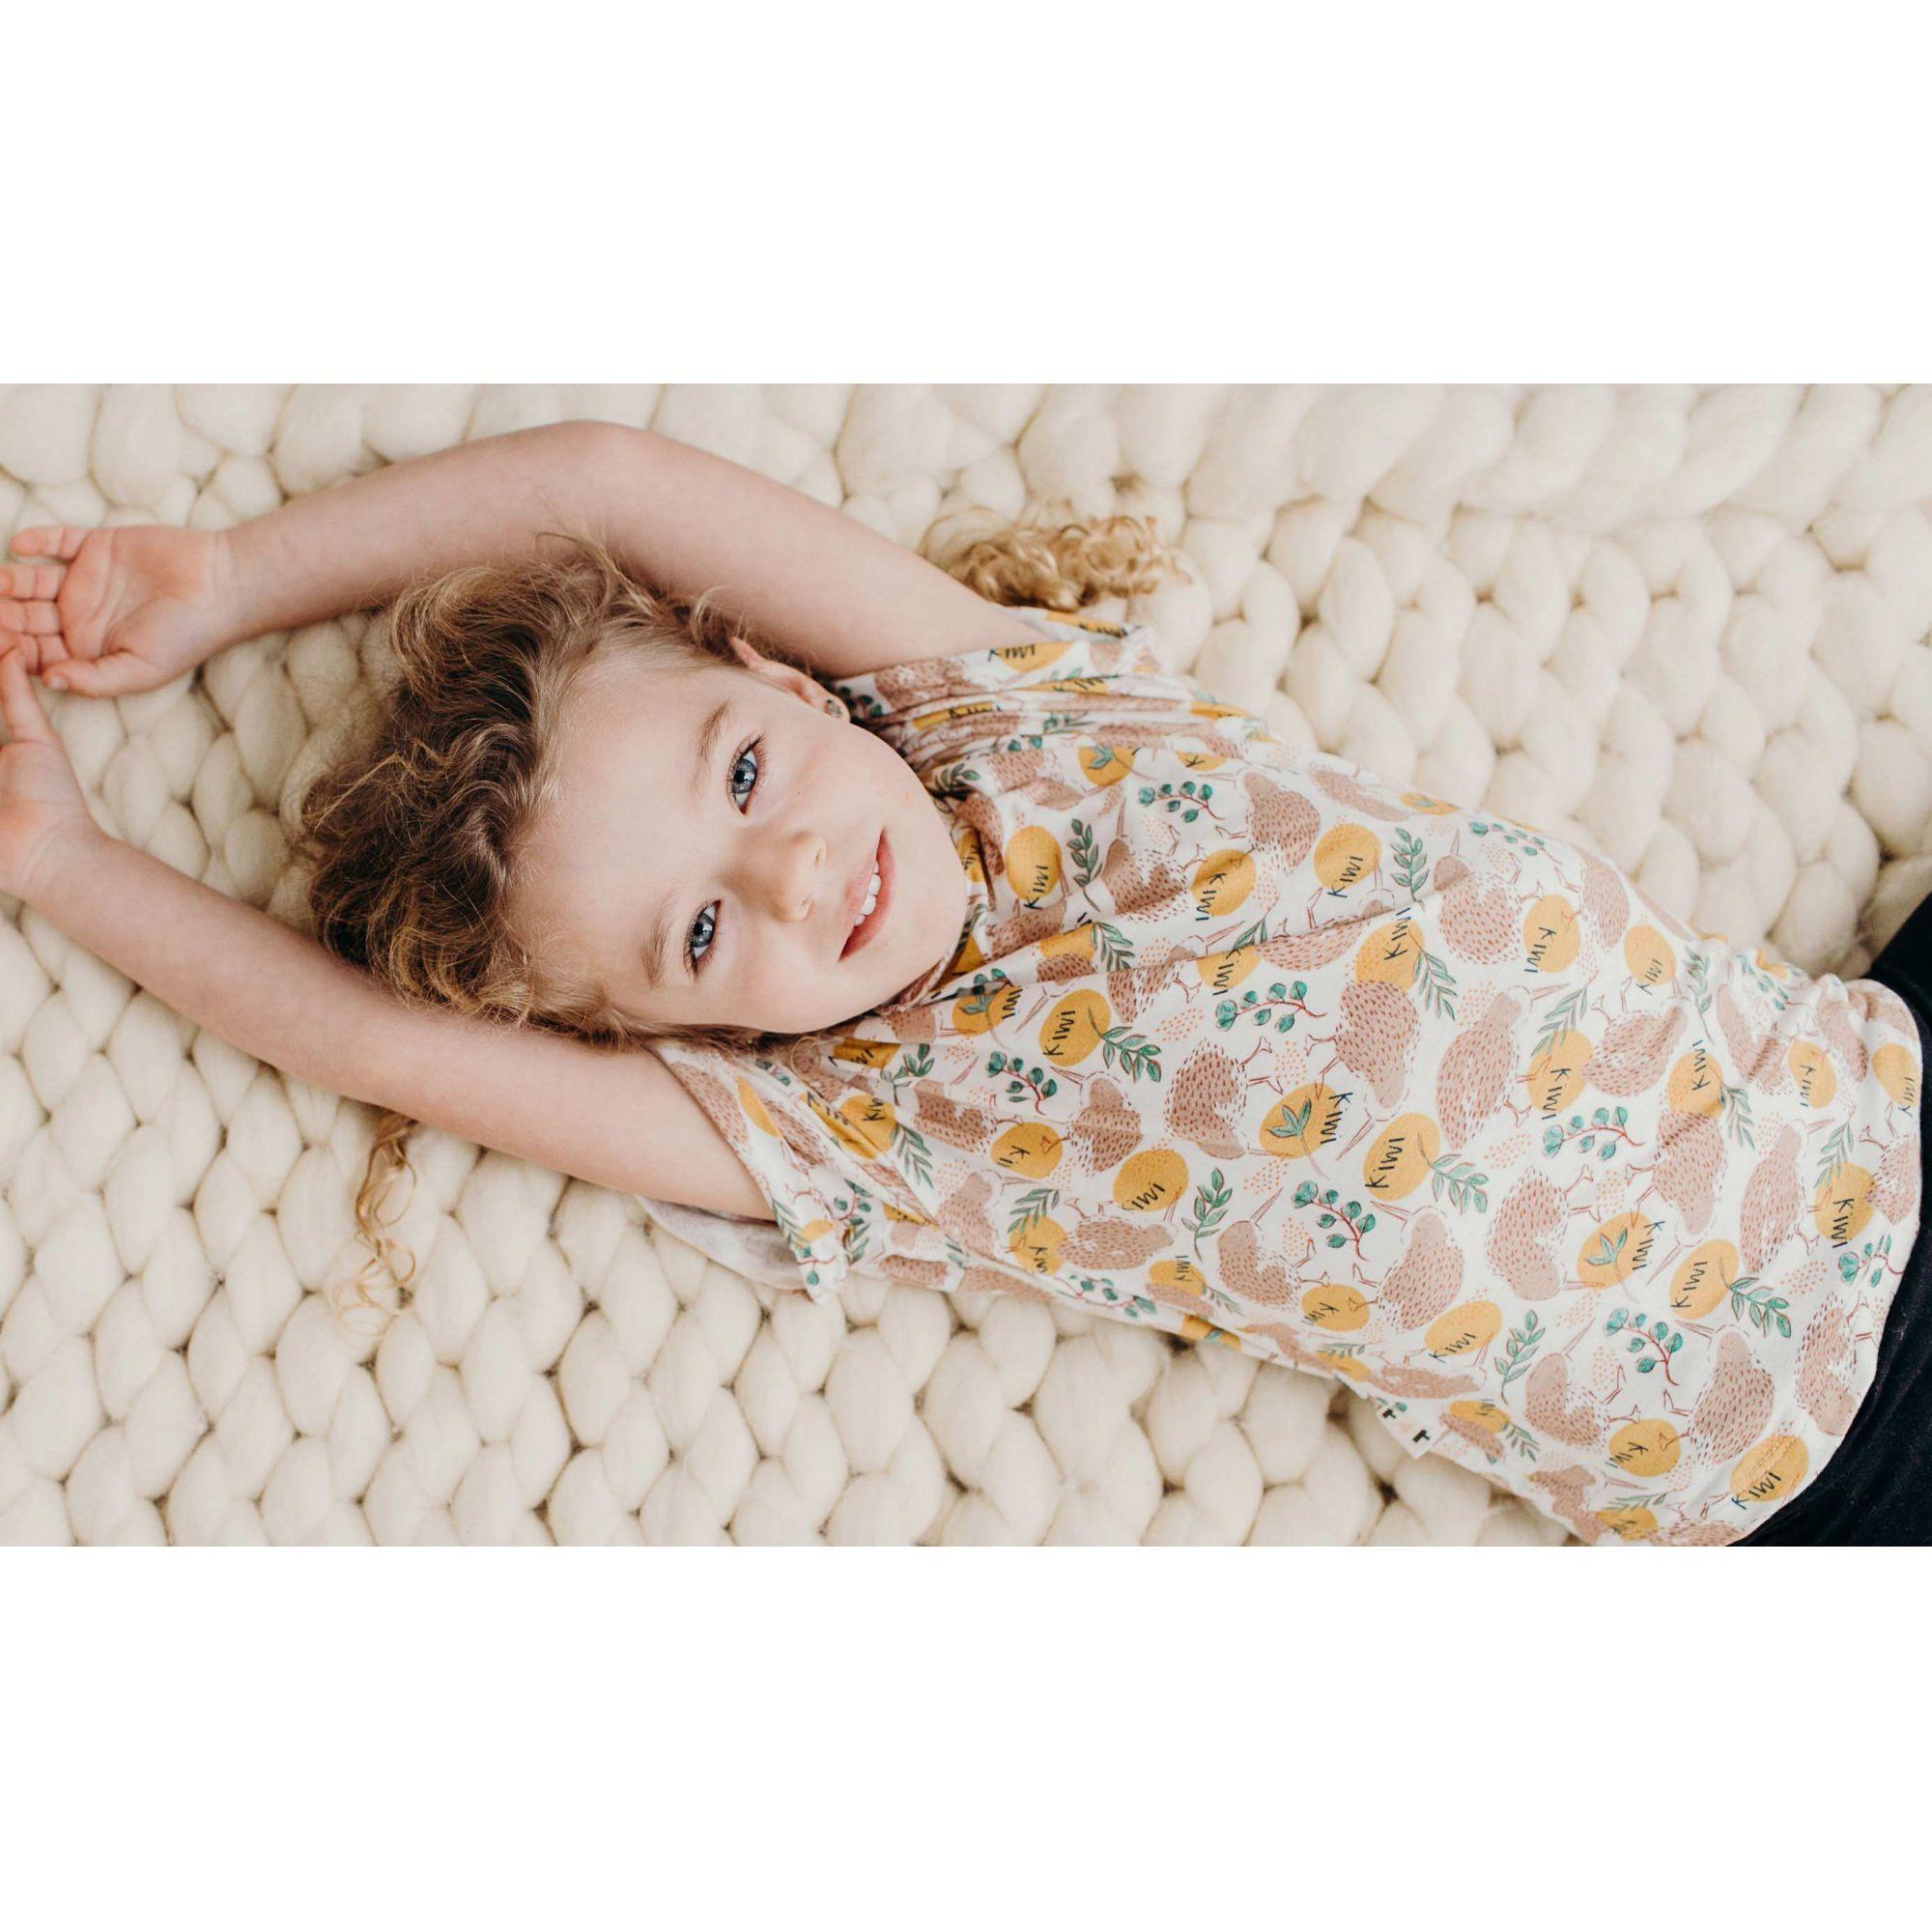 Kiwi camiseta  infantil micromodal